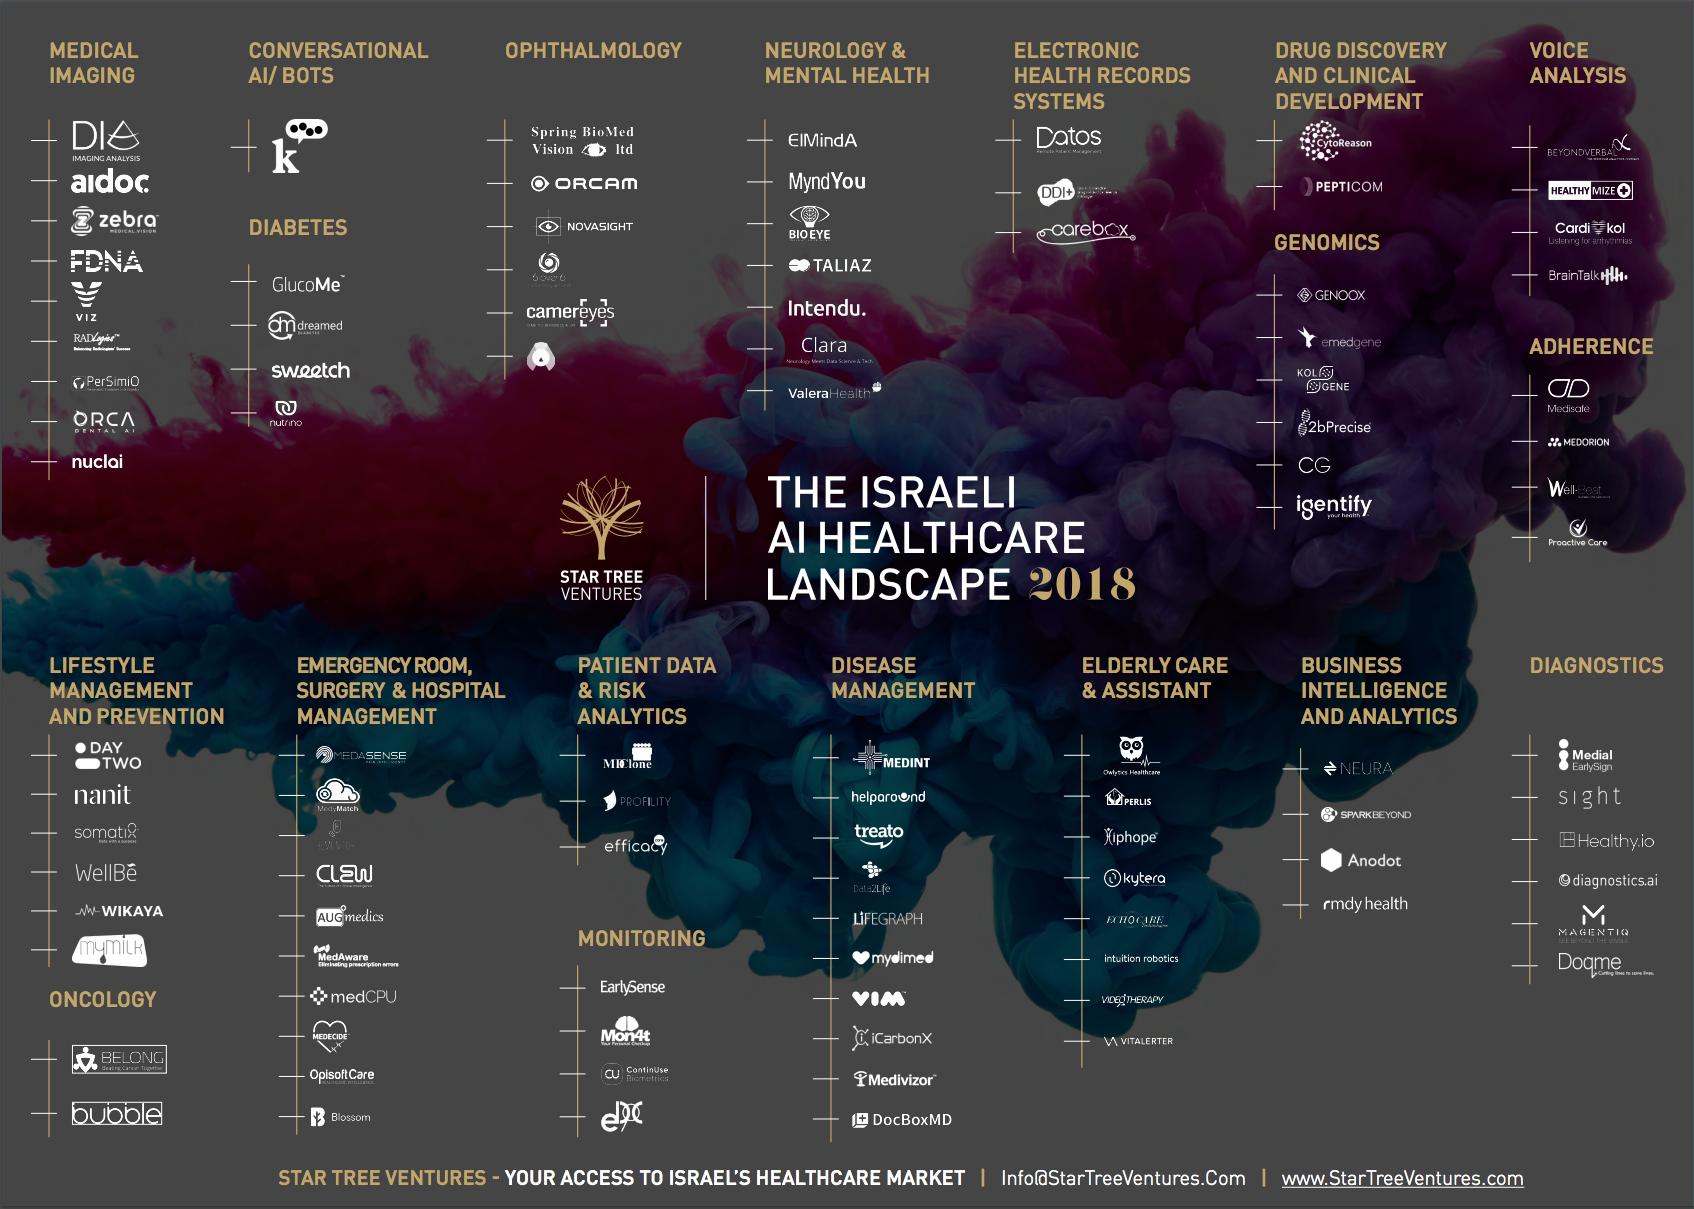 Israeli AI HealthCare Landscape